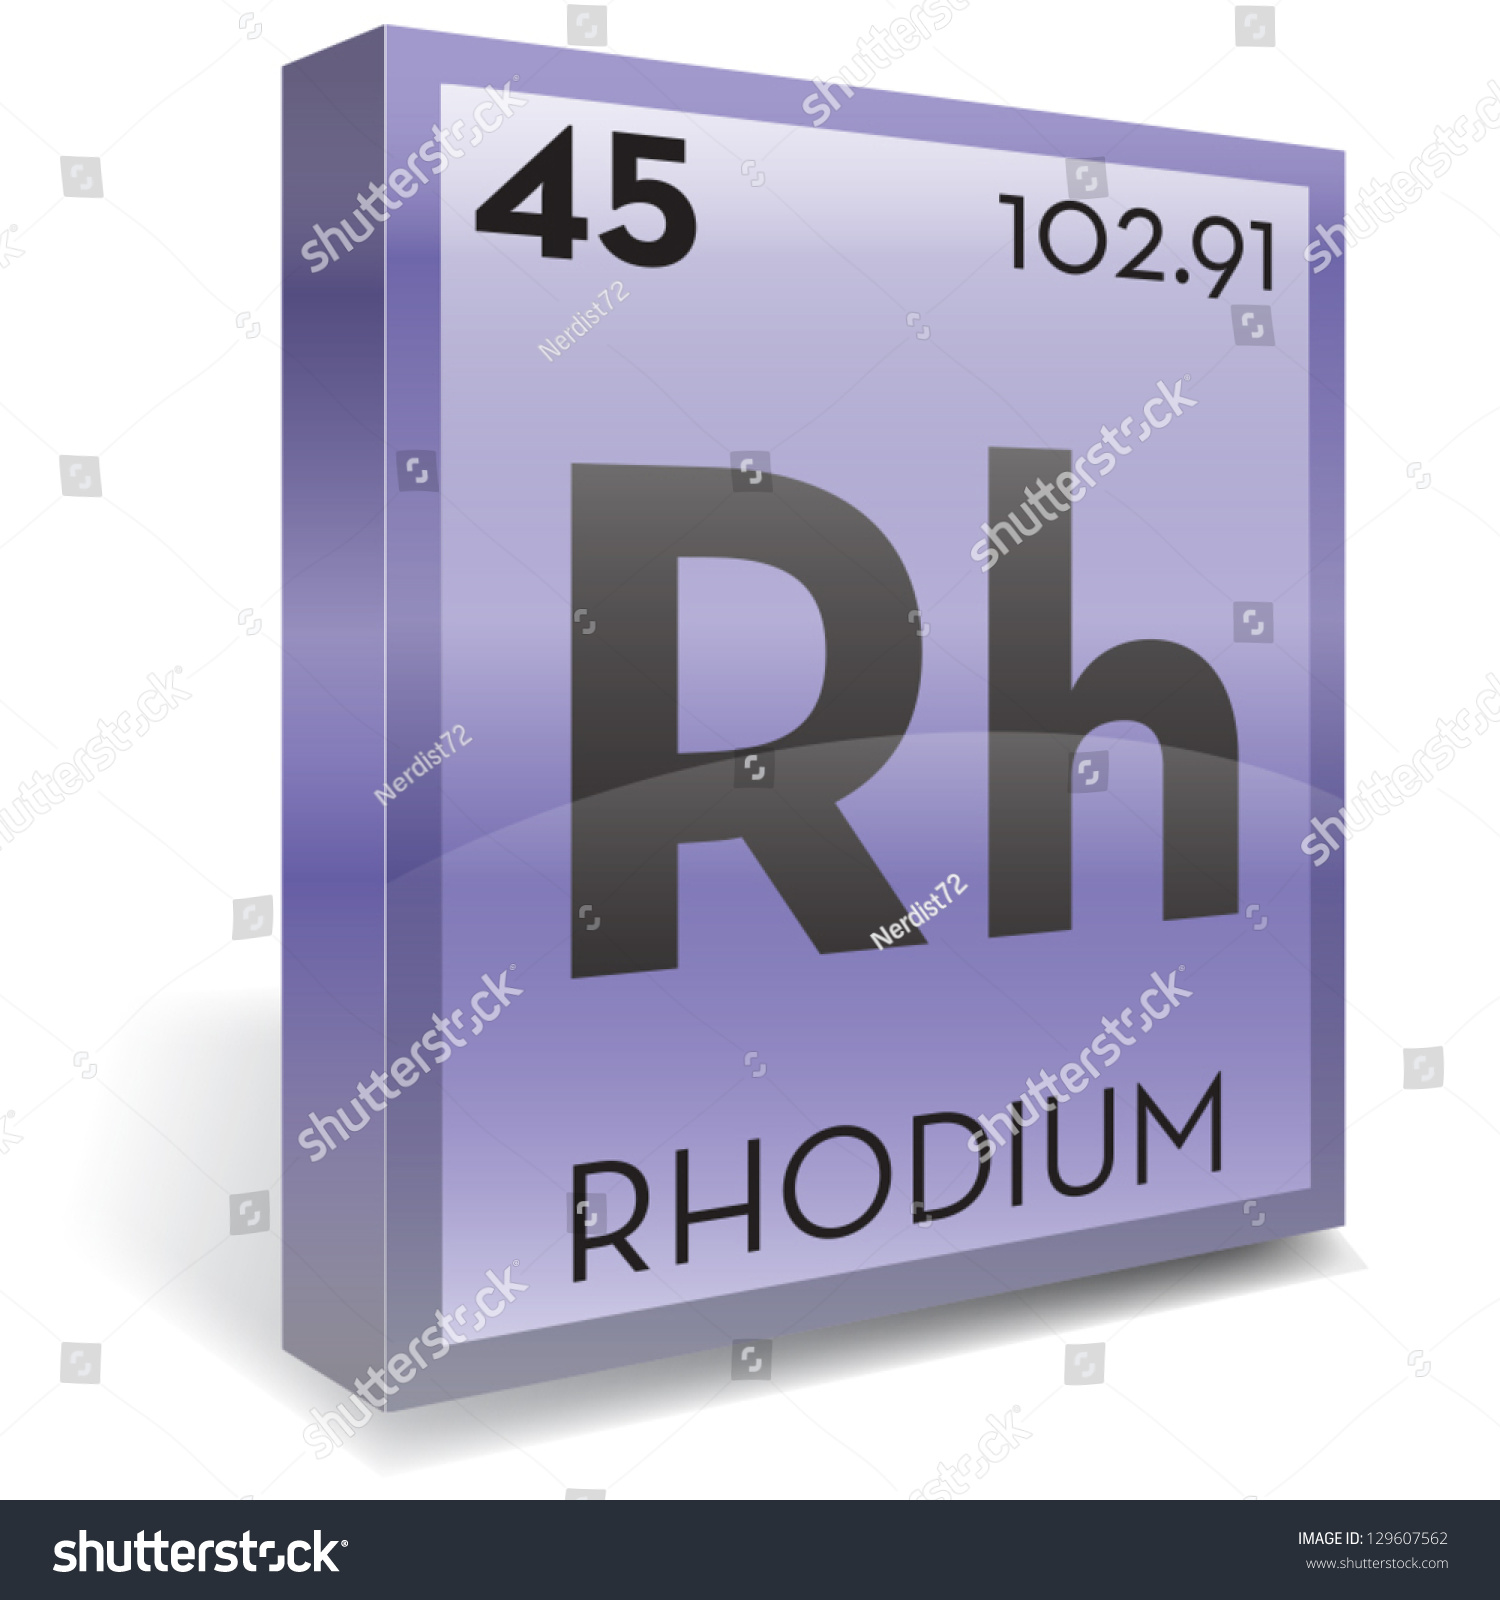 Rhodium Element Stock Vector Illustration 129607562 ... Rhodium Element Project